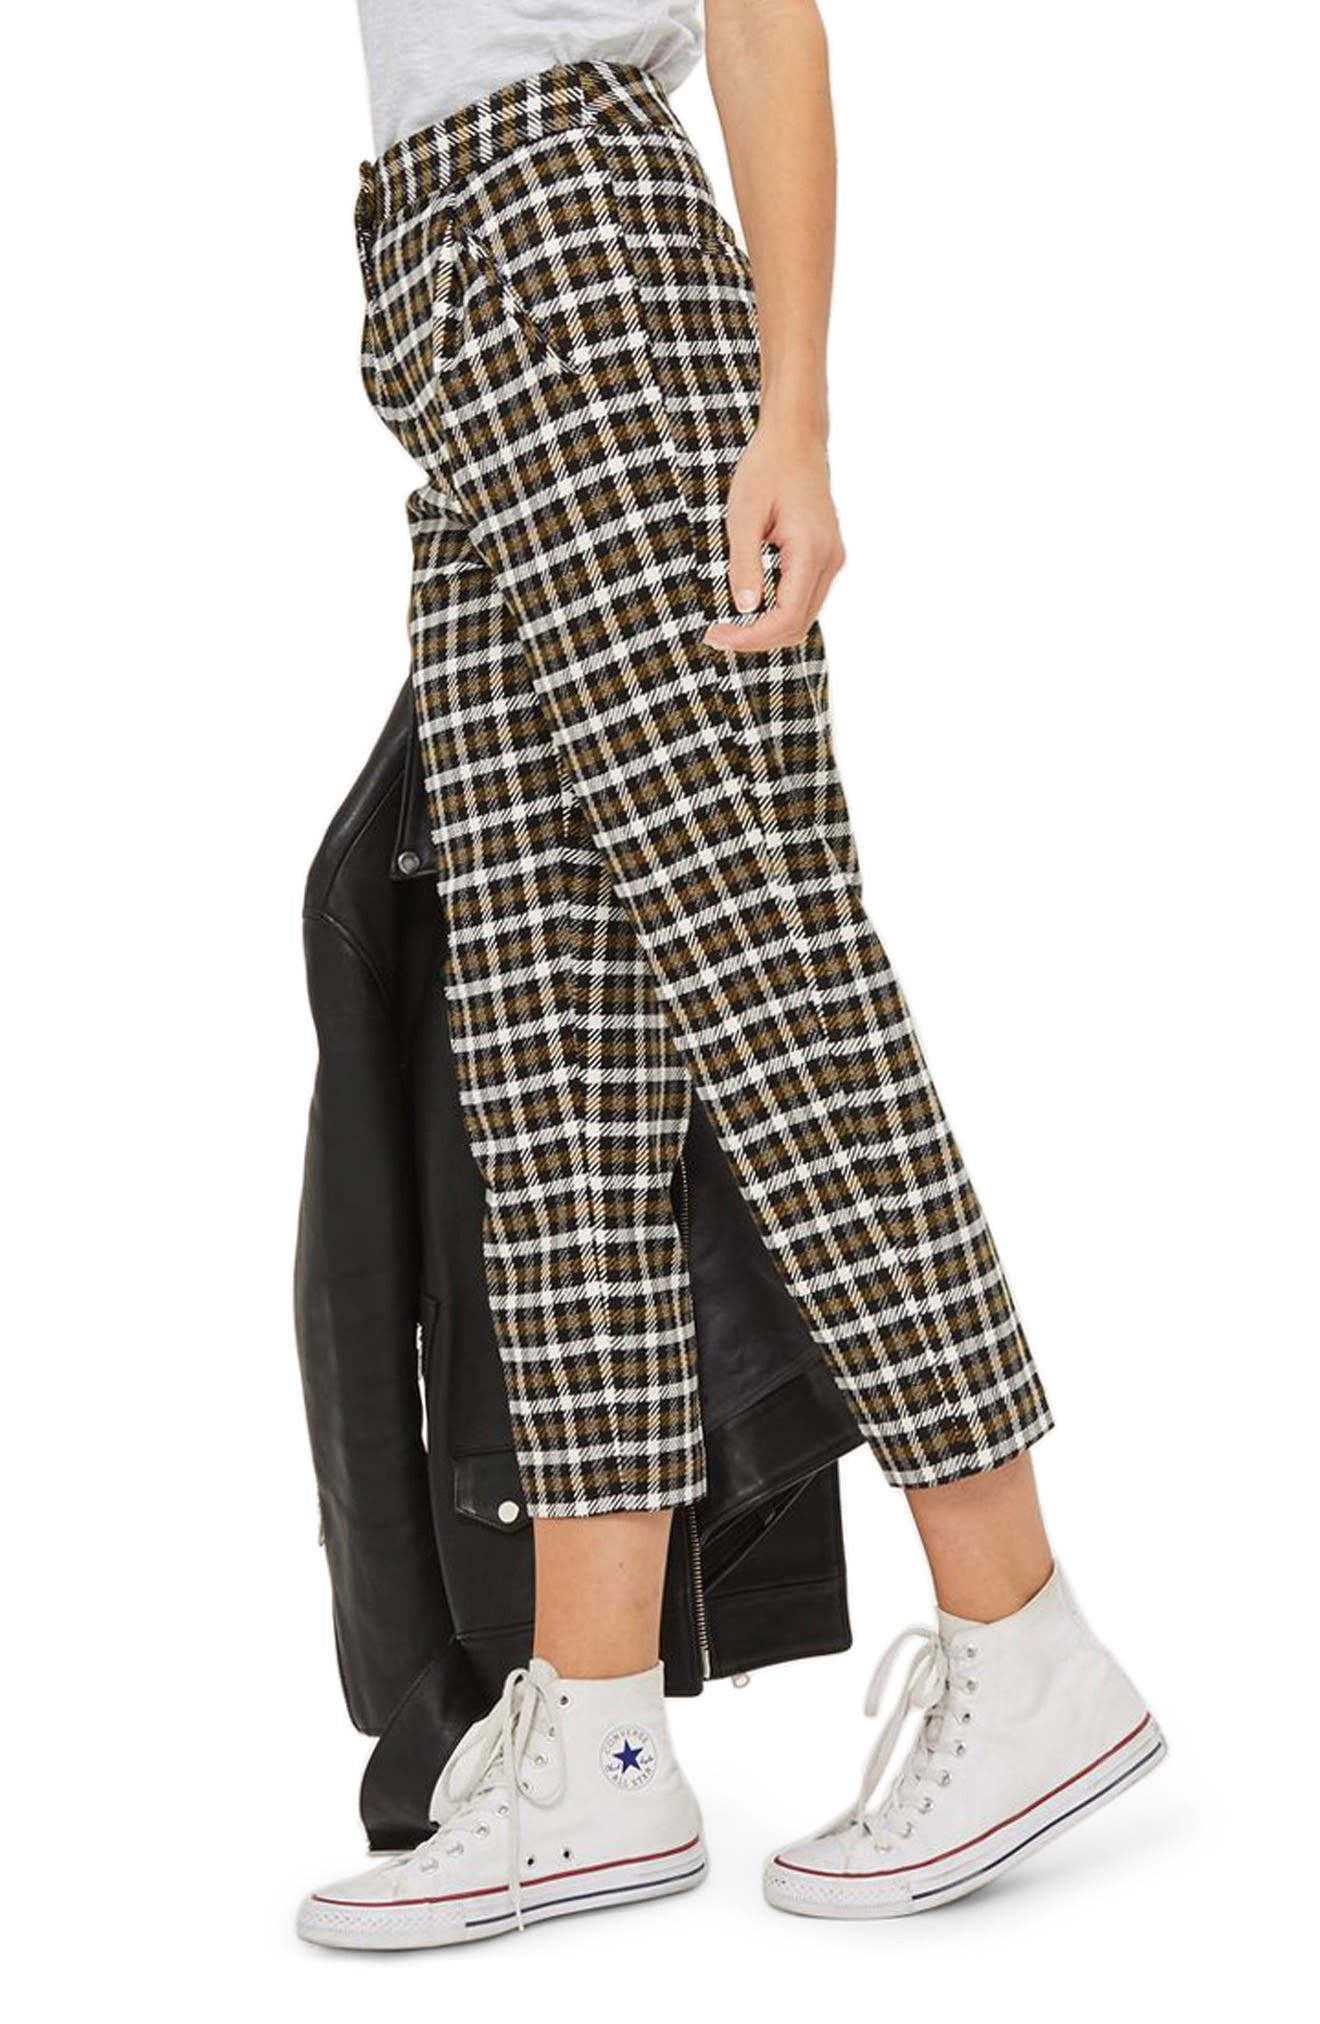 Monica Checked Peg Trousers,                             Main thumbnail 1, color,                             001